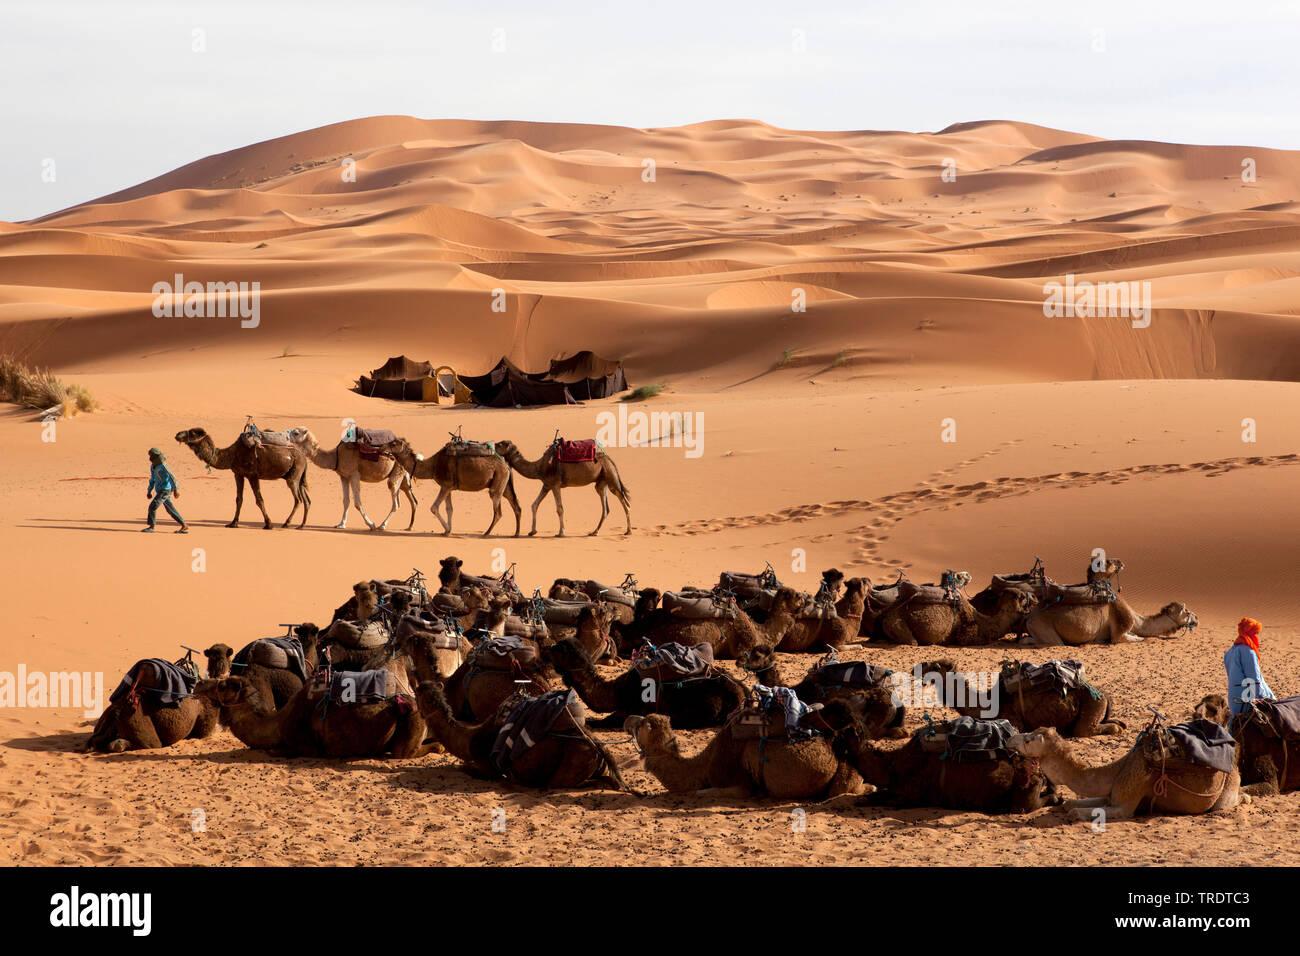 Karawane in der Sandwueste Erg Chebbi, Marokko | caravan in the Erg Chebbi desert, Morocco | BLWS510095.jpg [ (c) blickwinkel/AGAMI/A. Nusse Tel. +49 - Stock Image